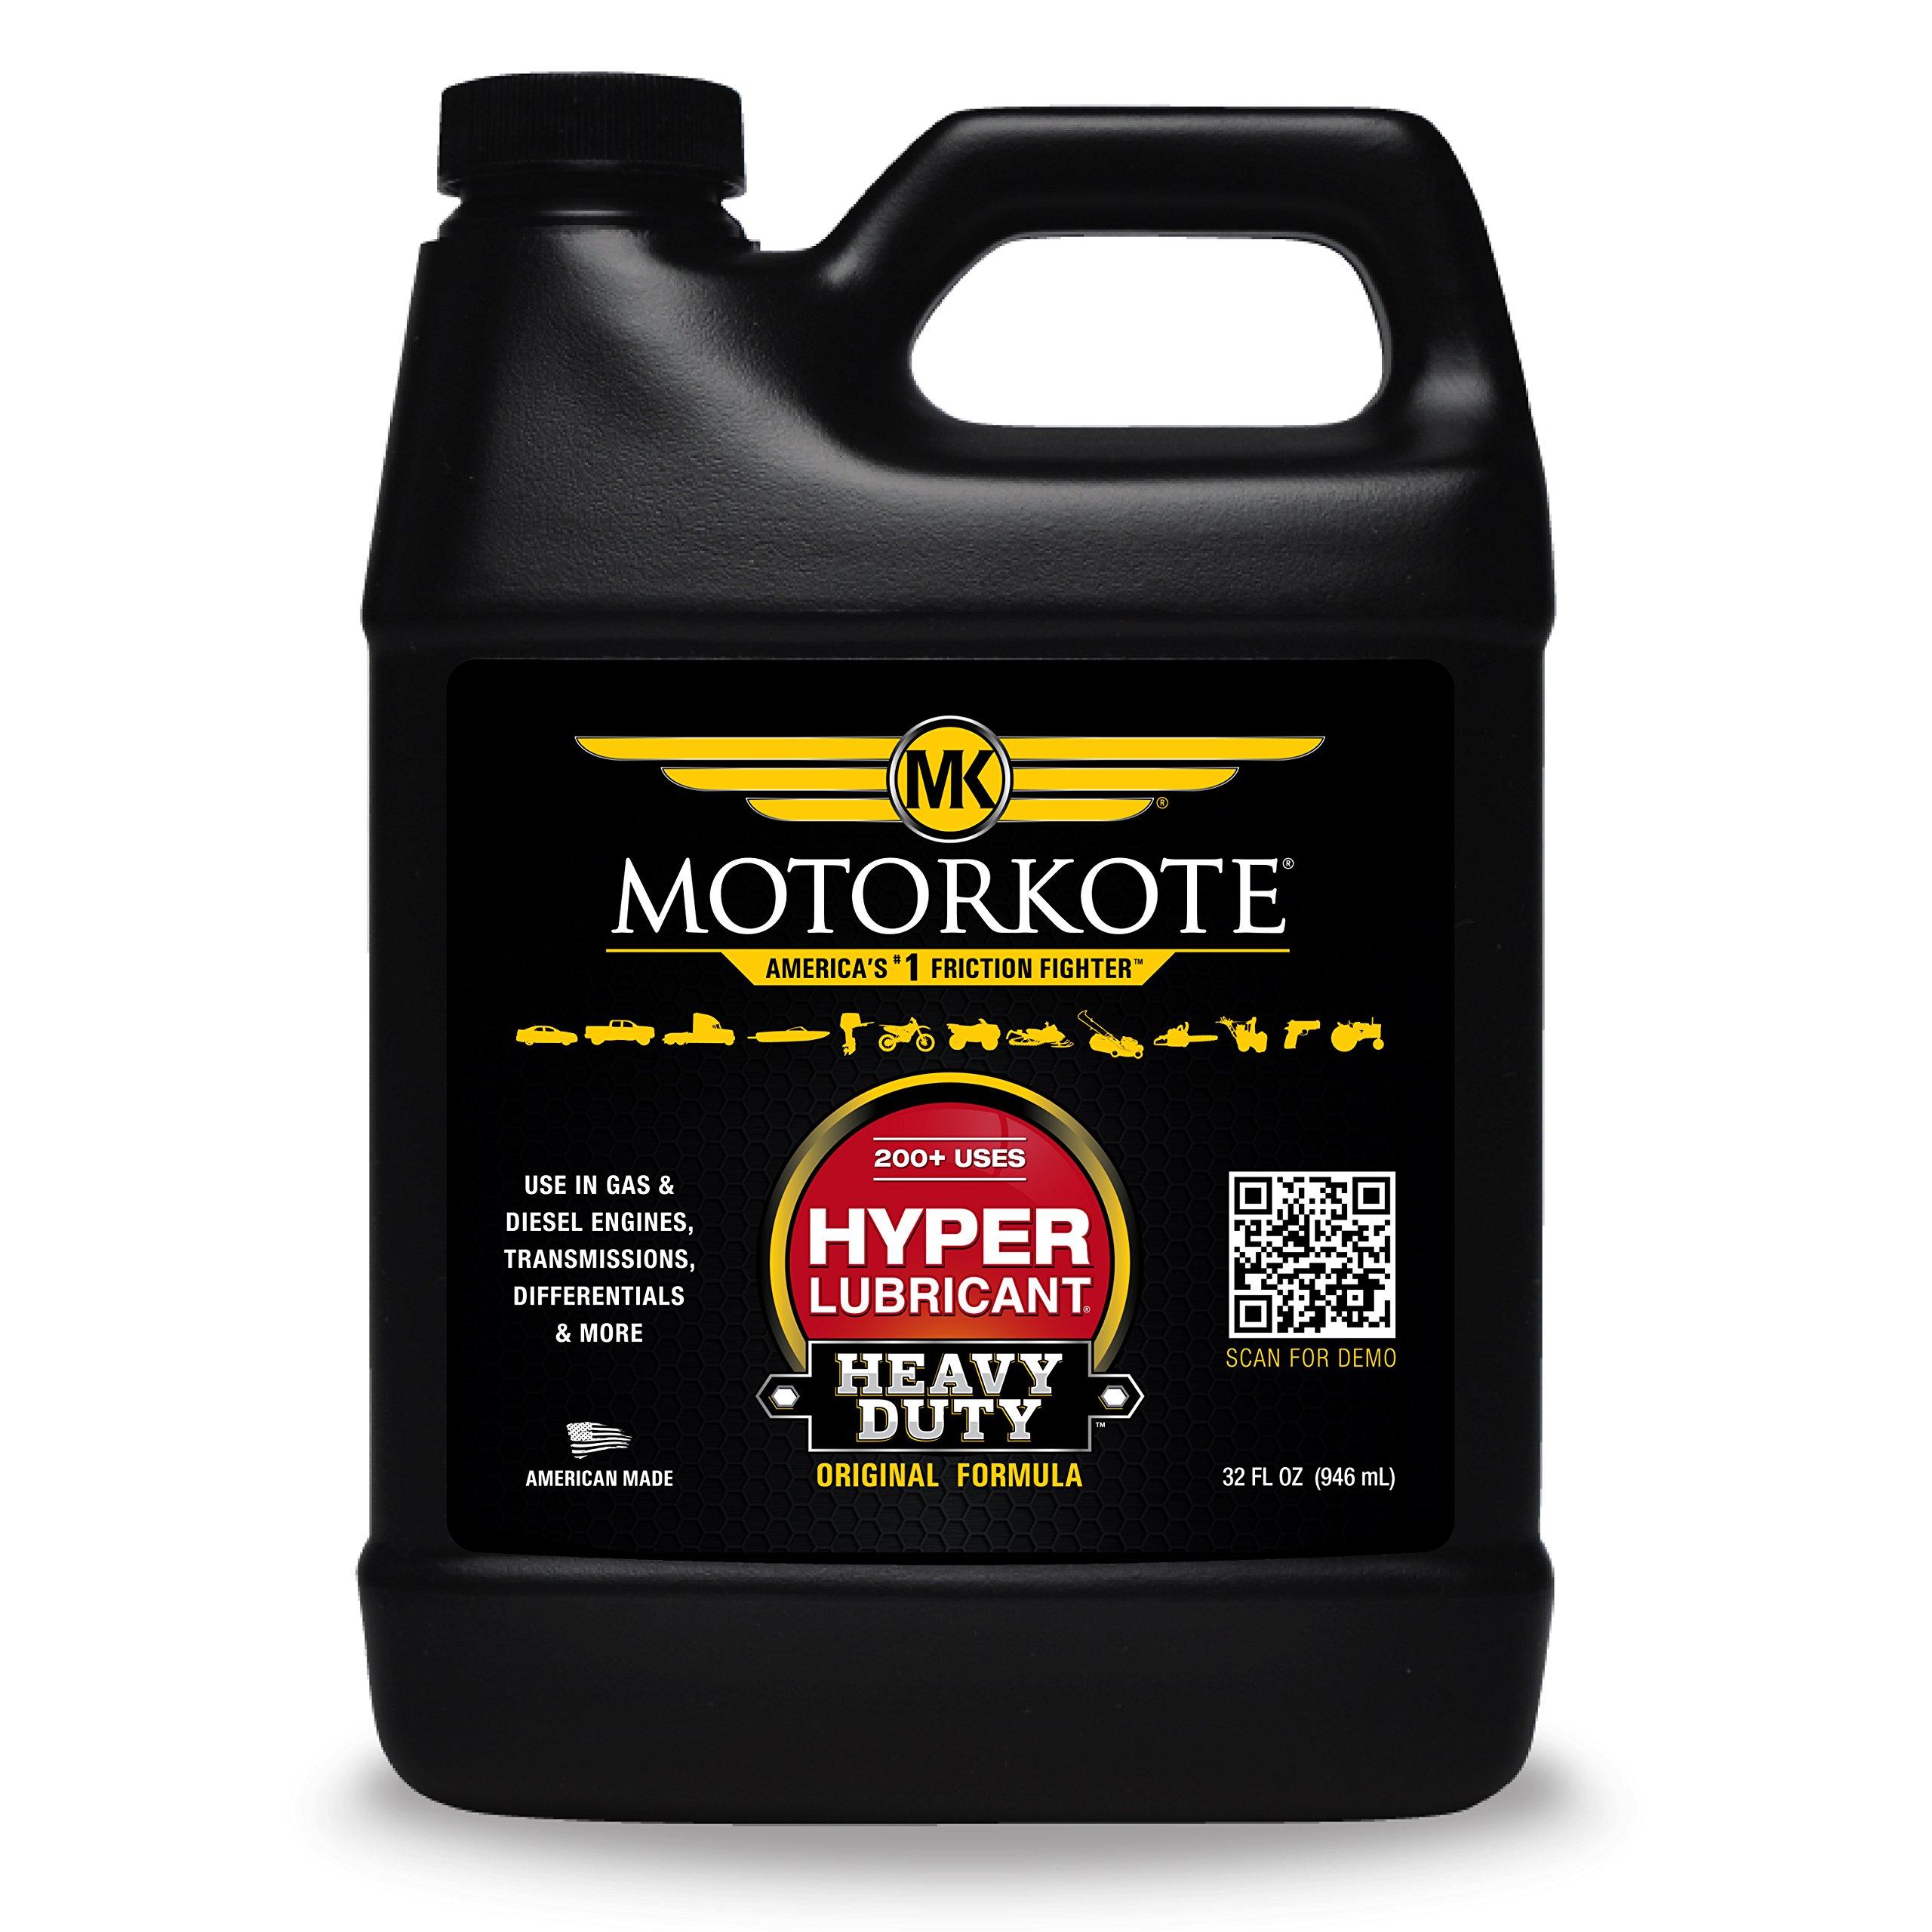 Motorkote MK-HL32-06-6PK Heavy Duty Hyper Lubricant, 32-Ounce, 6-Pack by Motorkote (Image #2)